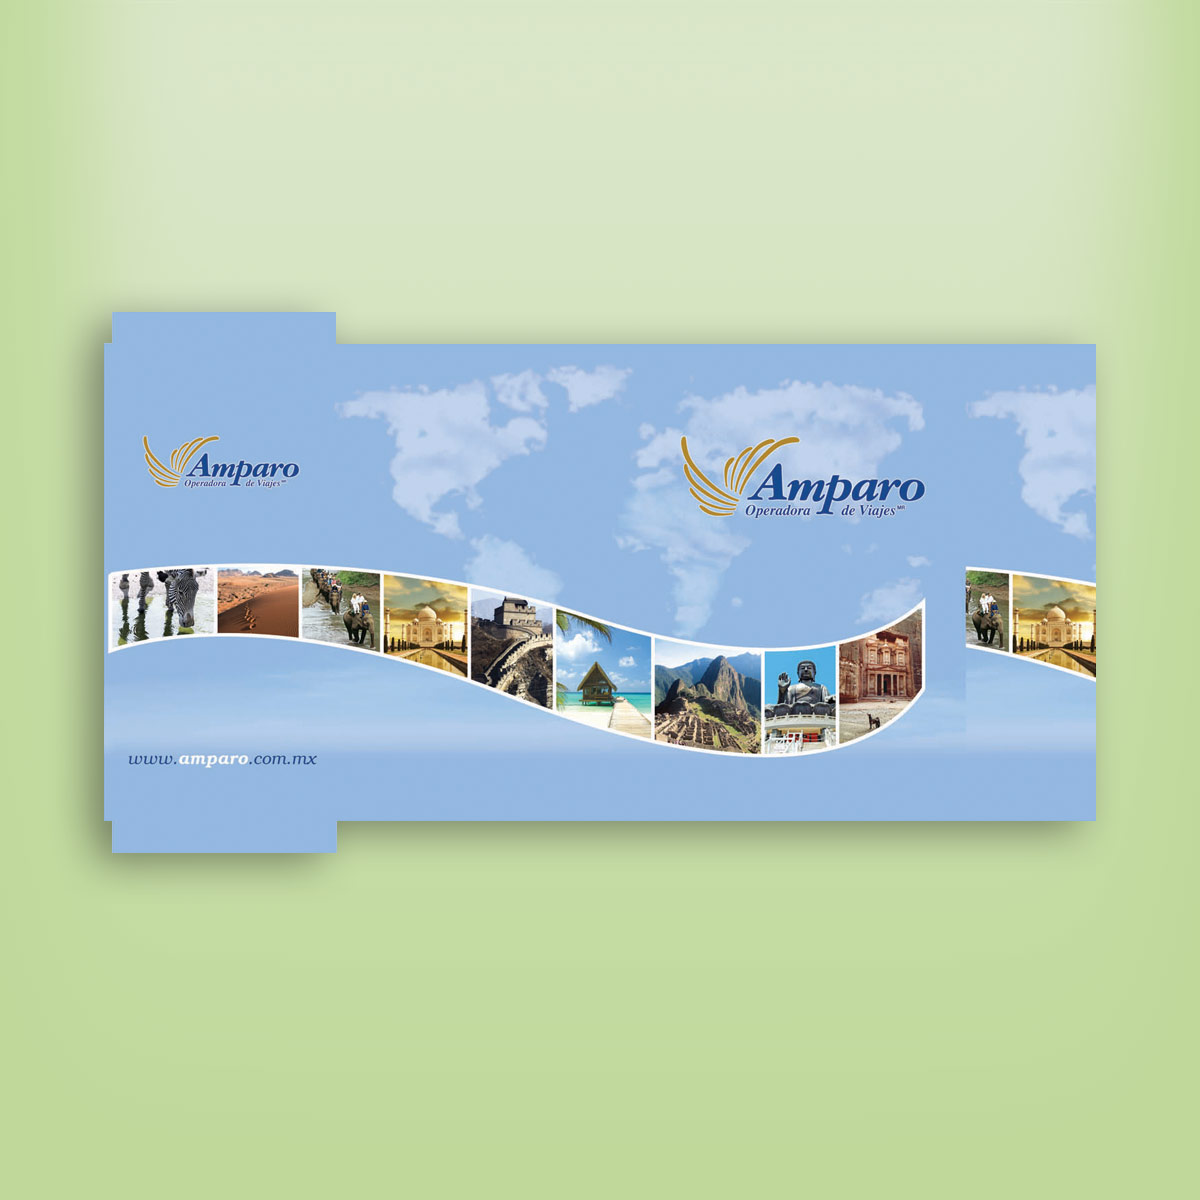 diseño de cartera para documentos Amparo